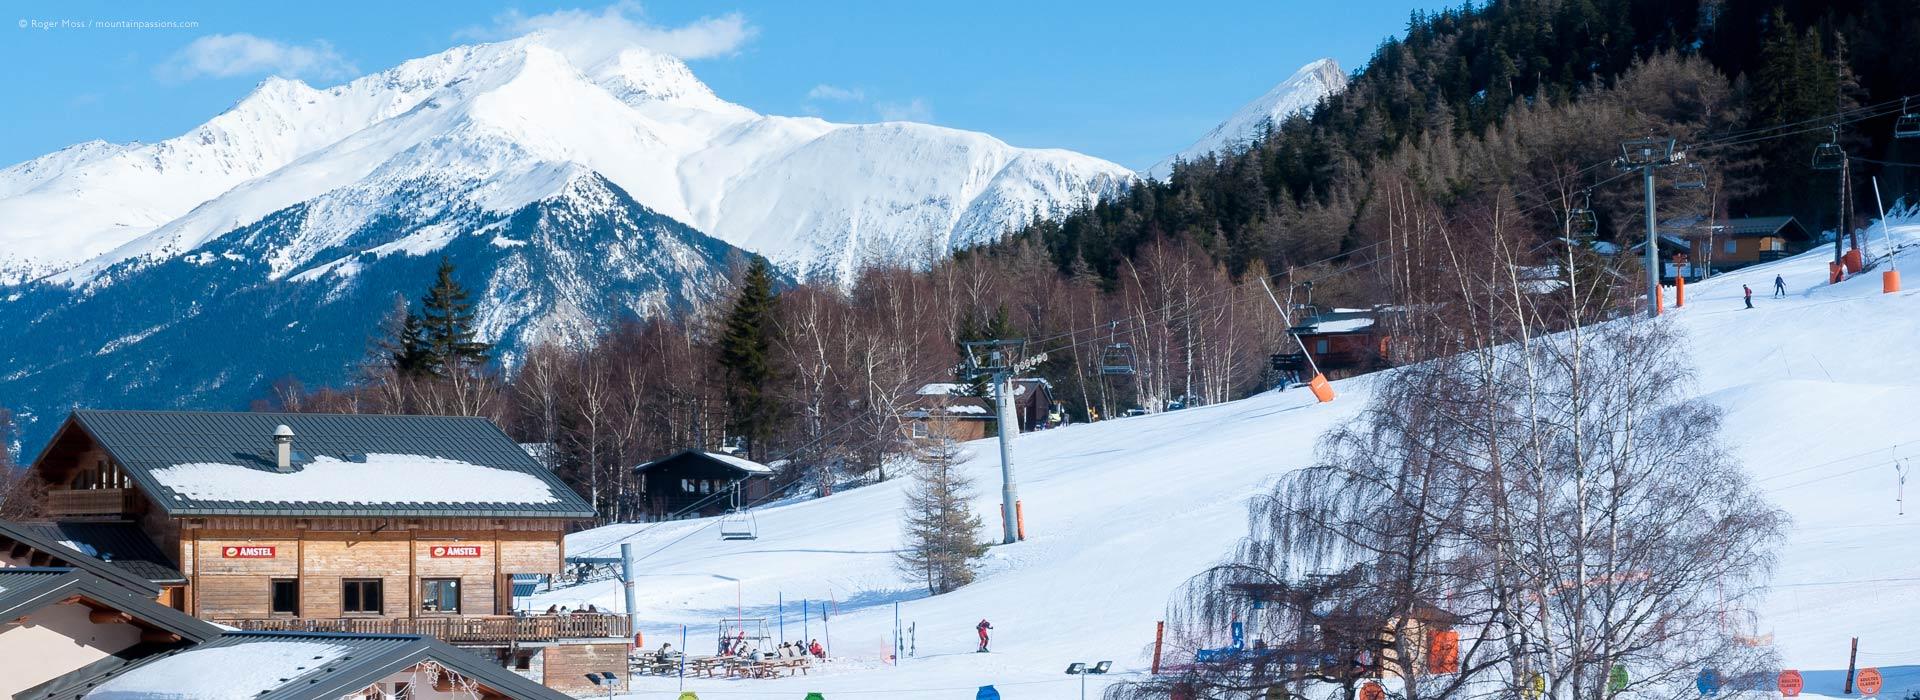 View of ski lifts, bar and mountains at La Norma